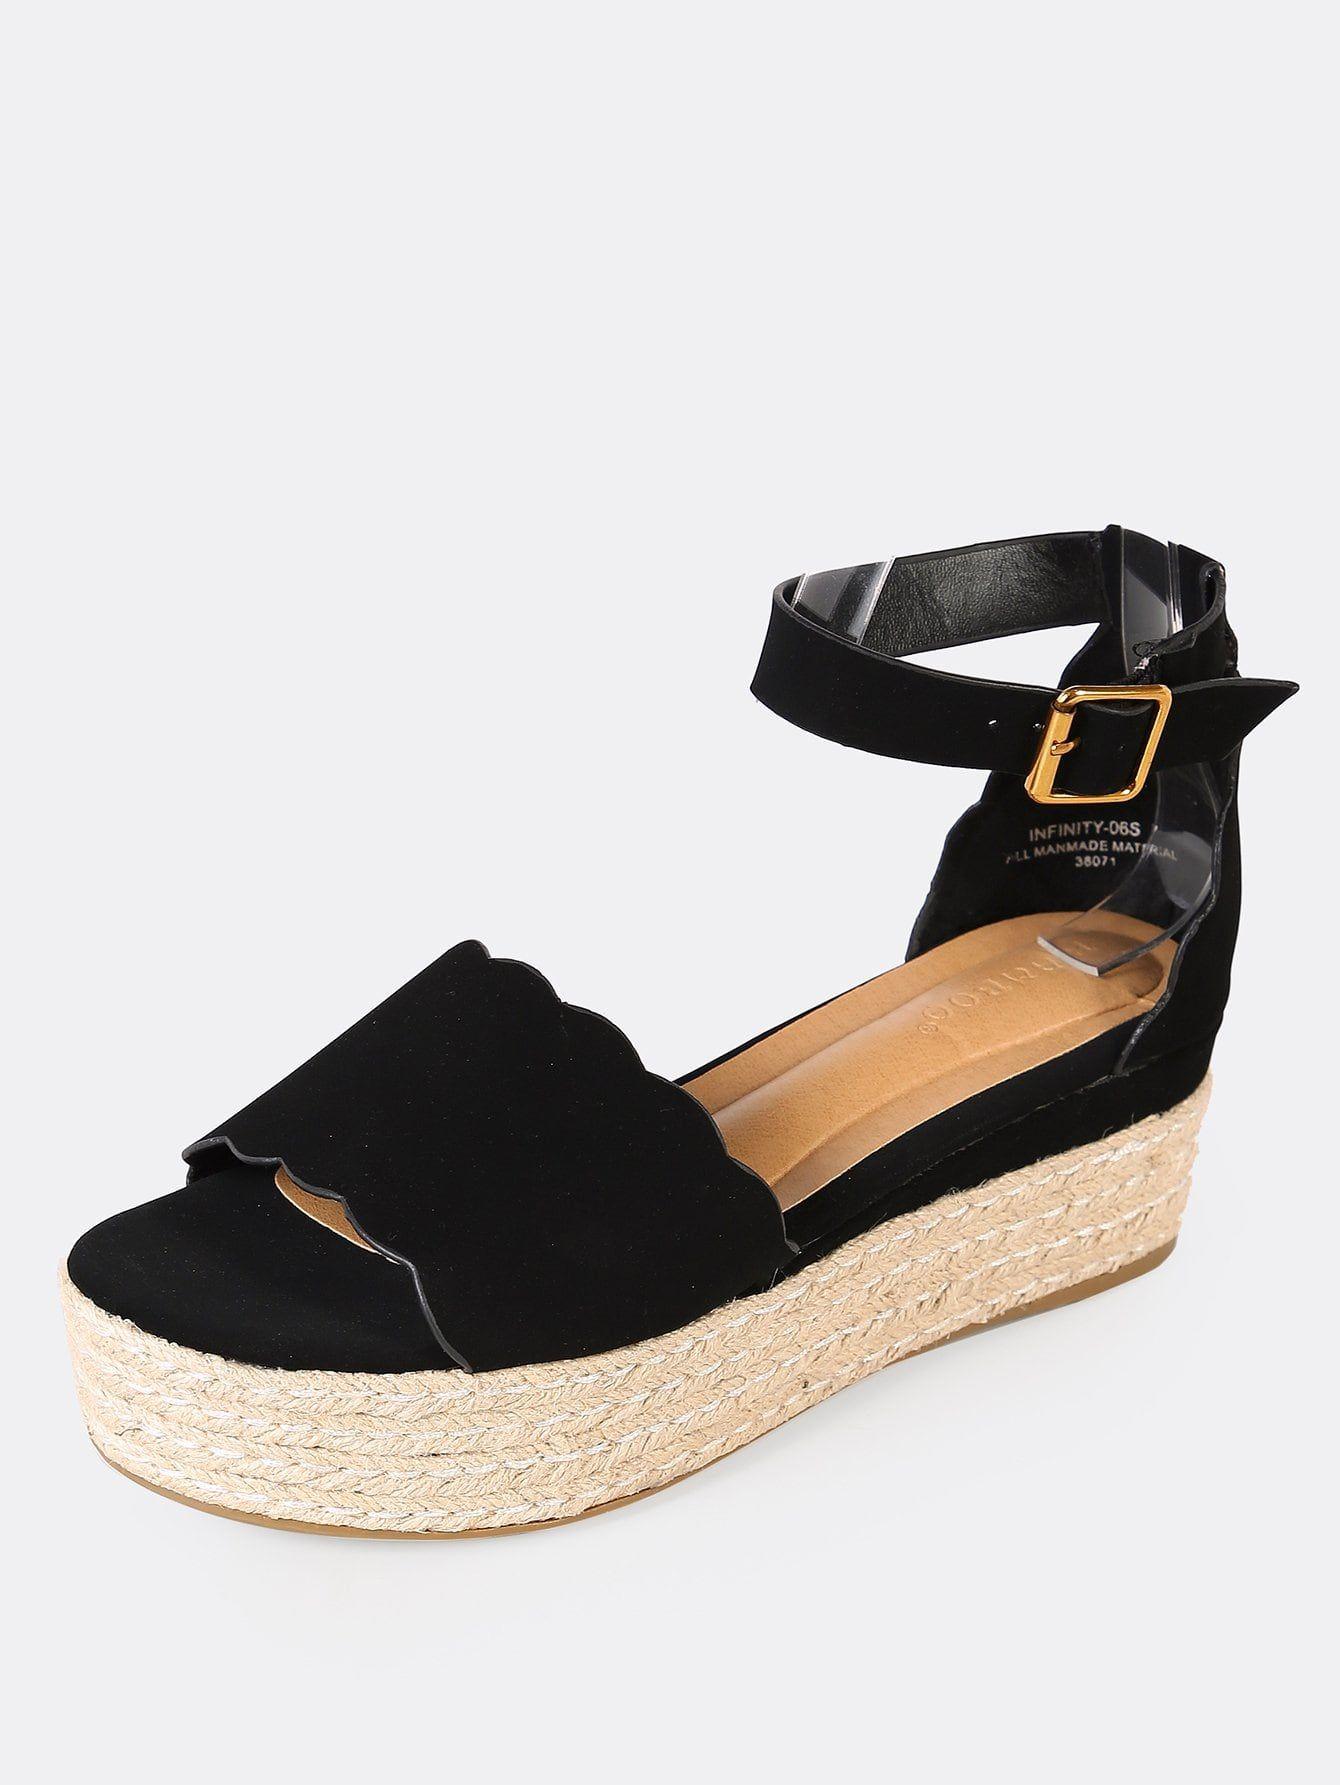 8370c967a7e Casual Peep Toe Ankle strap Black Mid Heel Espadrille Scallop Open Toe  Flatform Espadrille Wedge